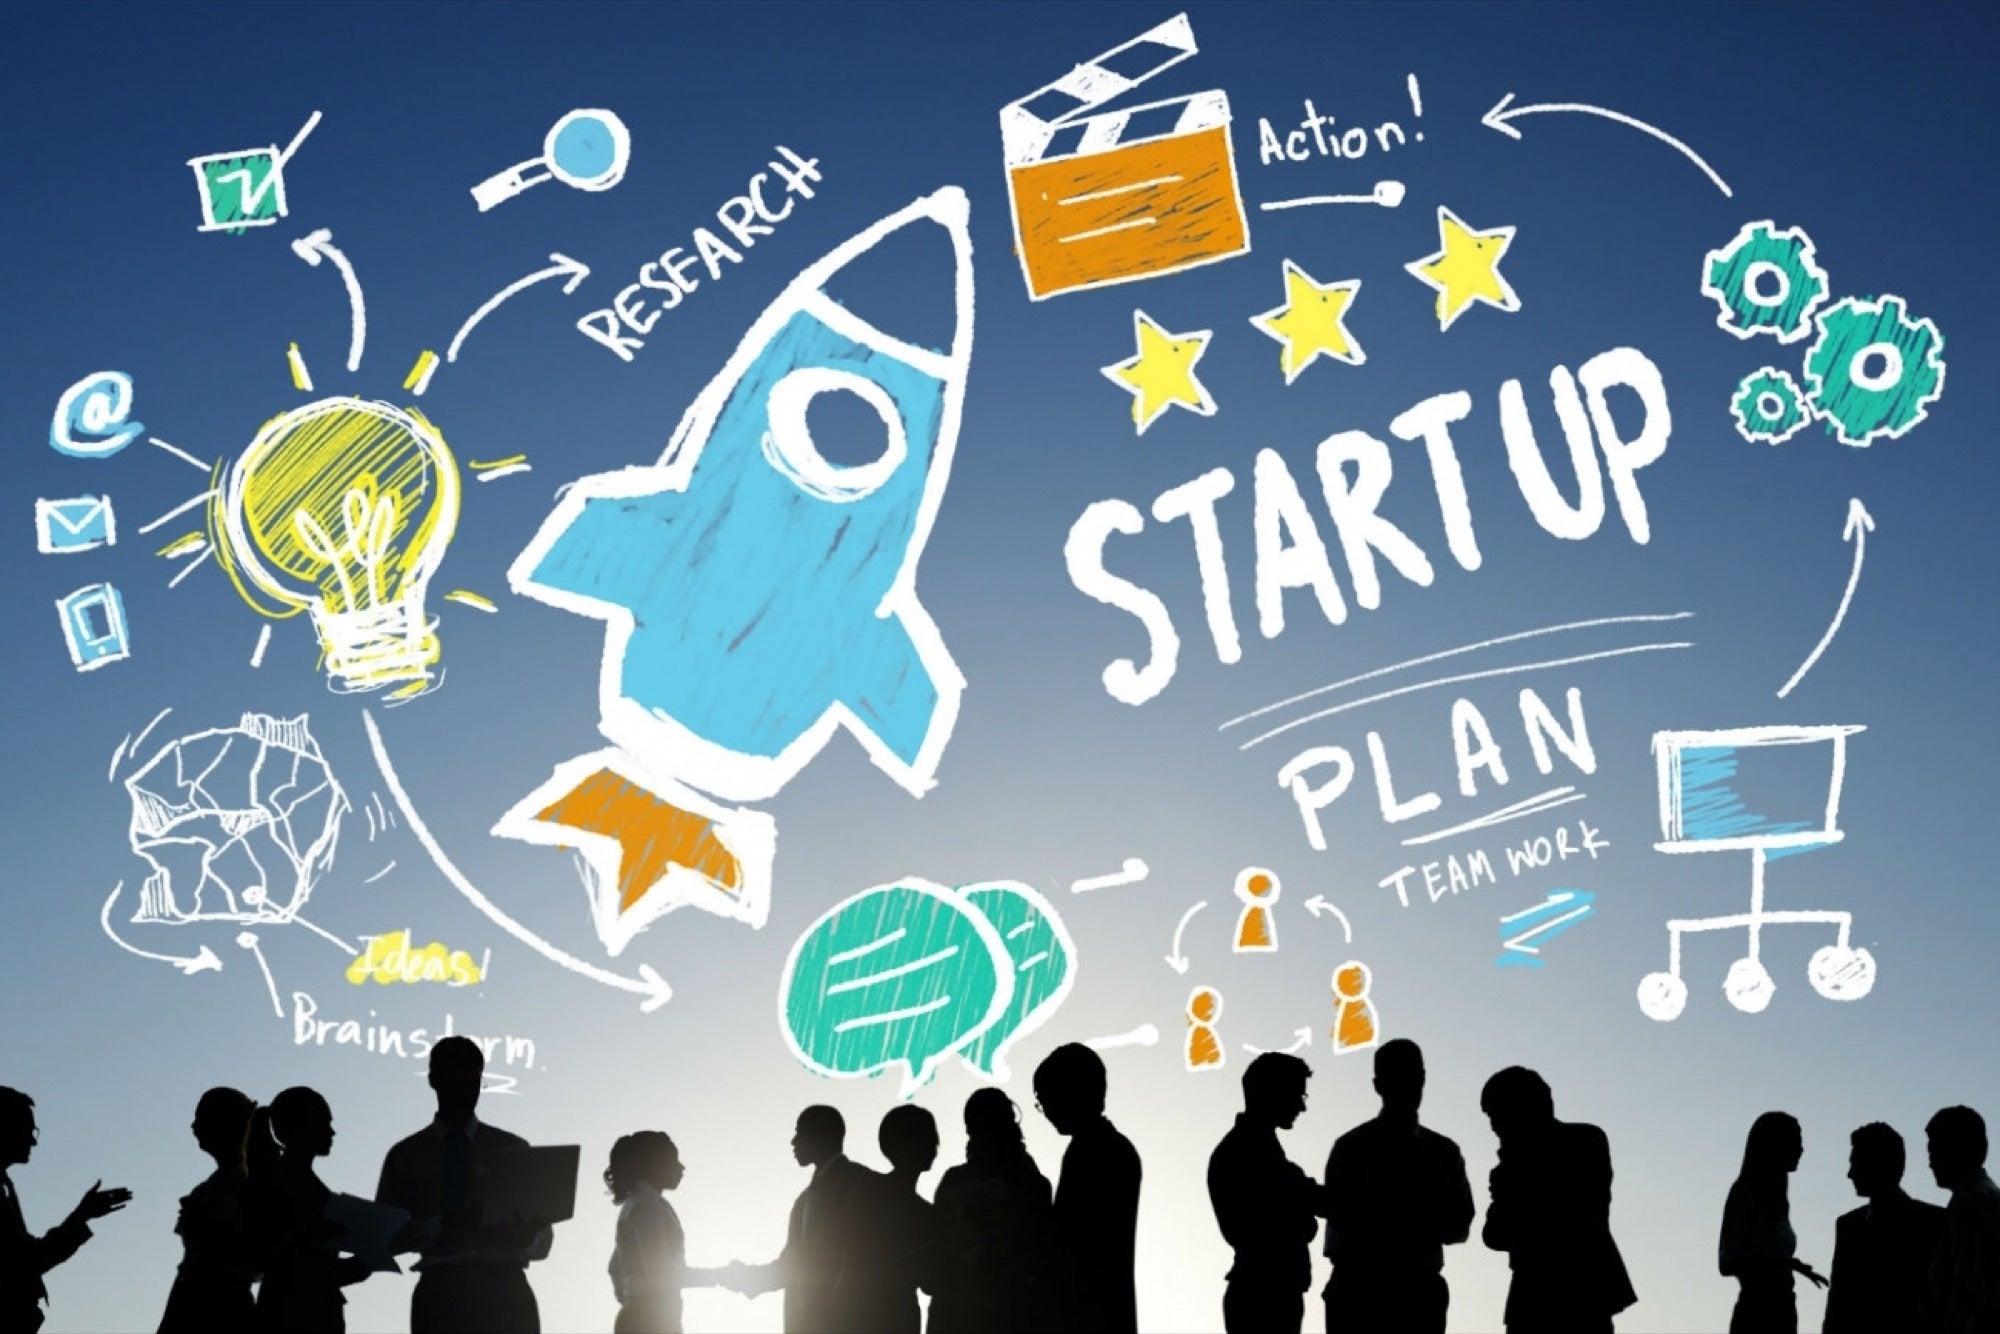 Startup venture capital resources